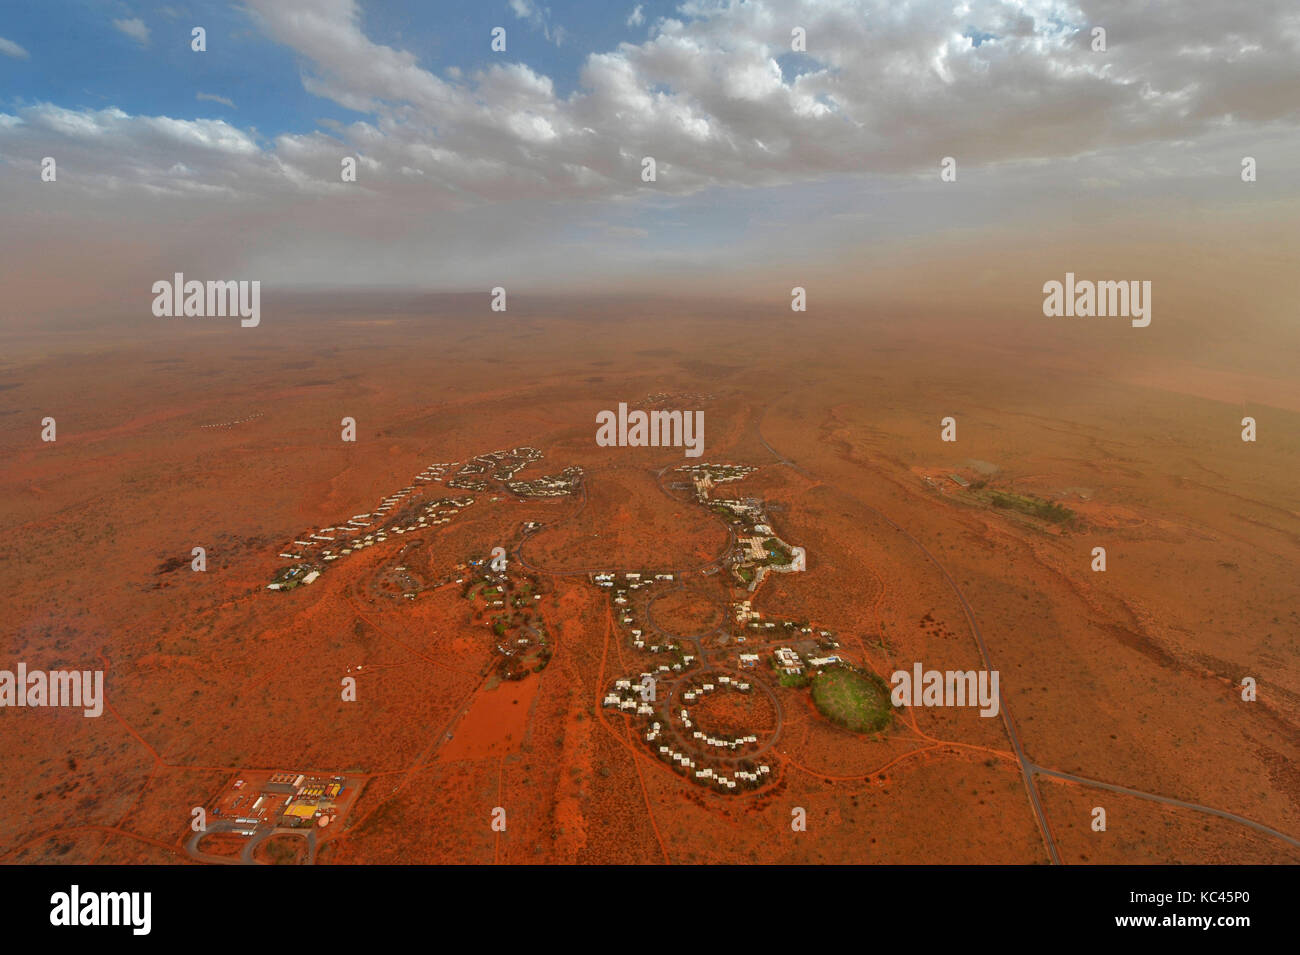 Luftaufnahme des Ortes yulara mit Uluru (ayres Rock) in Australiens Northern Territory, bei Sonnenuntergang. Stockbild